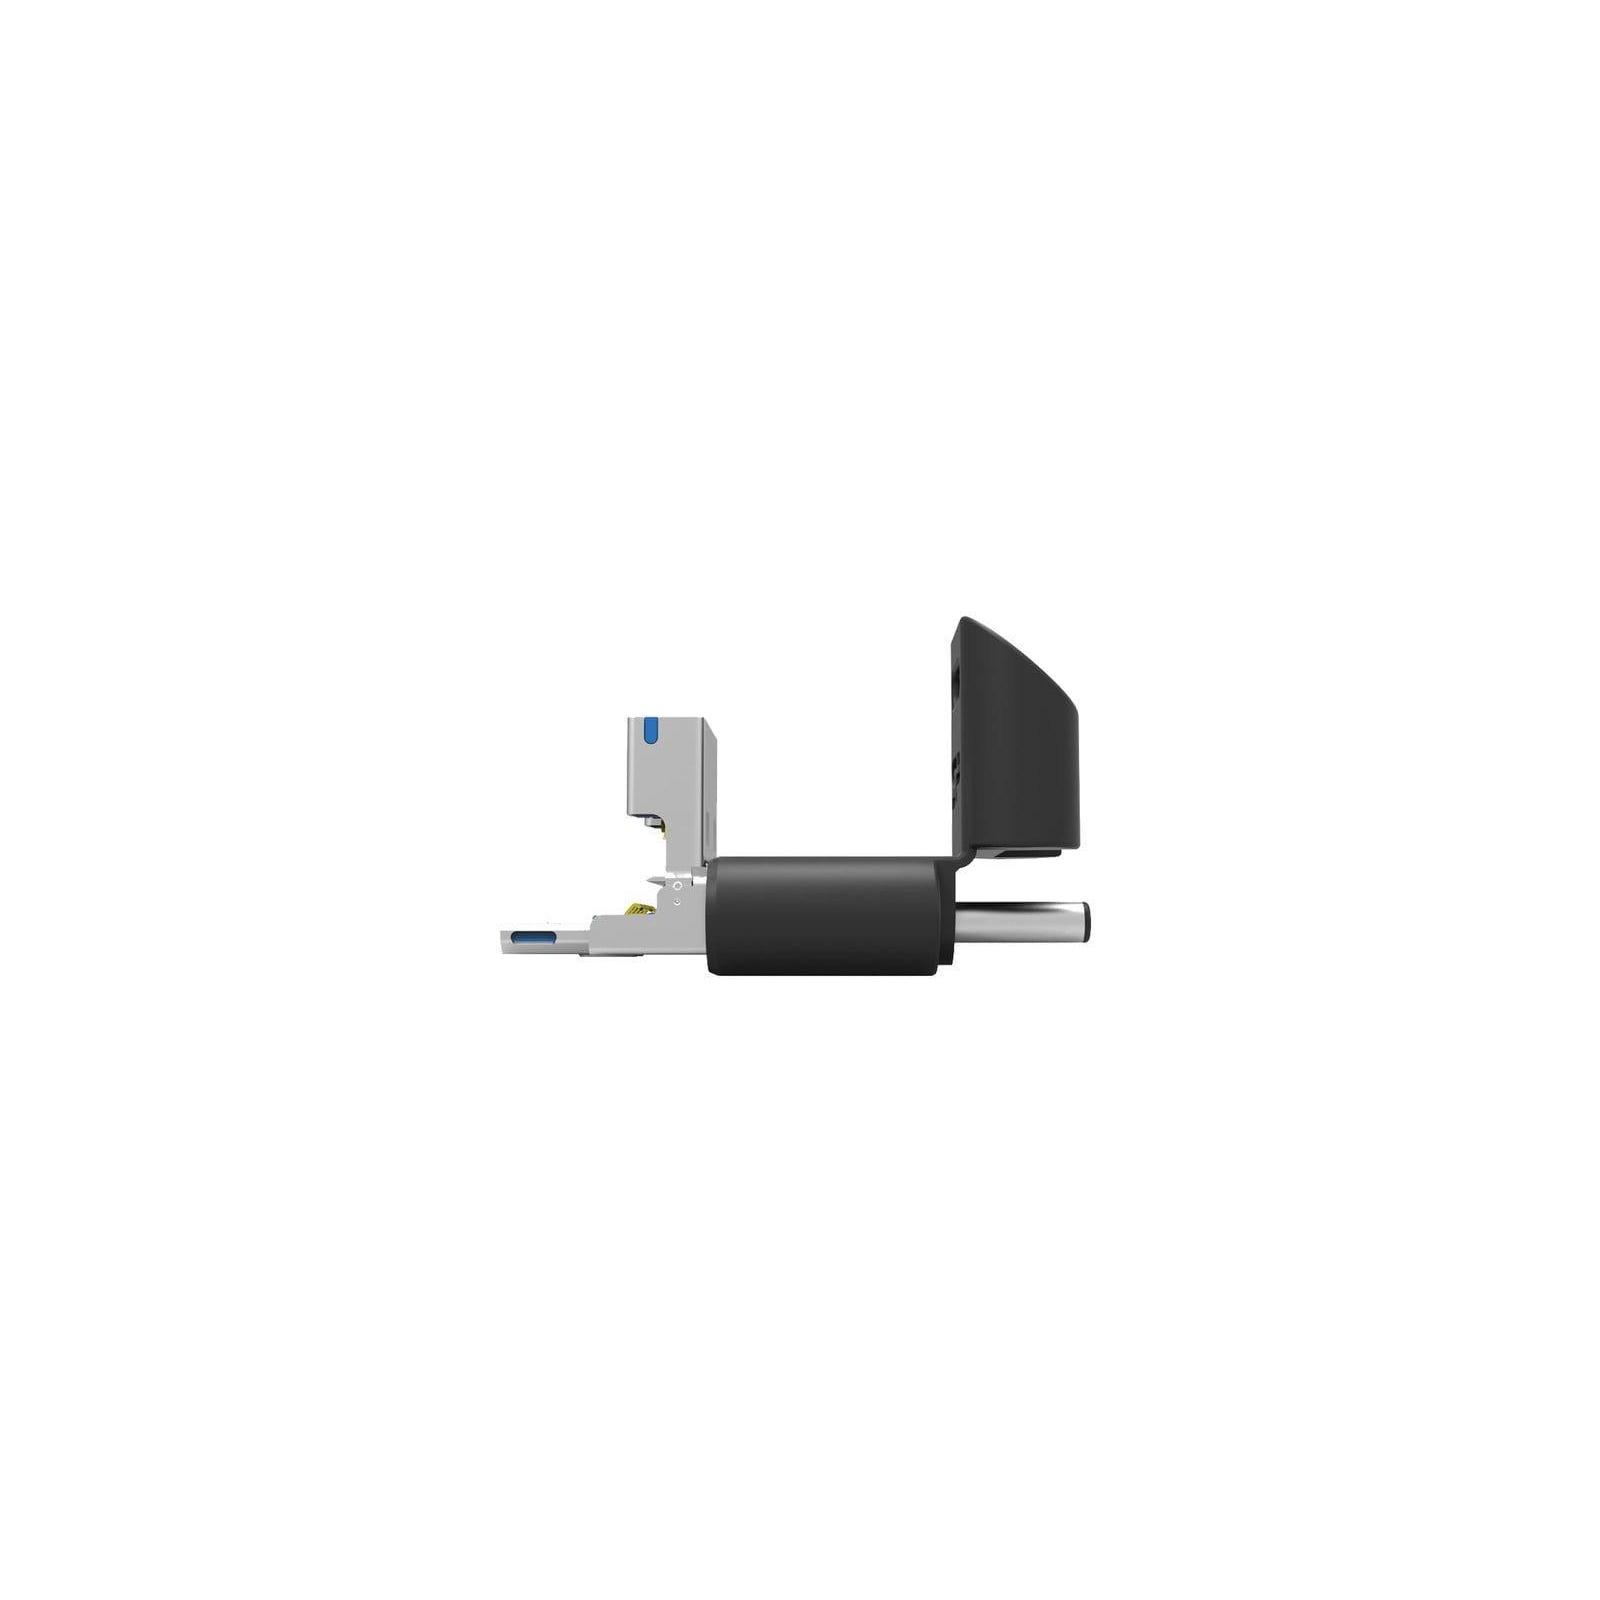 USB флеш накопитель Silicon Power 32GB Mobile C USB 3.1 / Type-C / microUSB (SP032GBUC3C50V1K) изображение 6